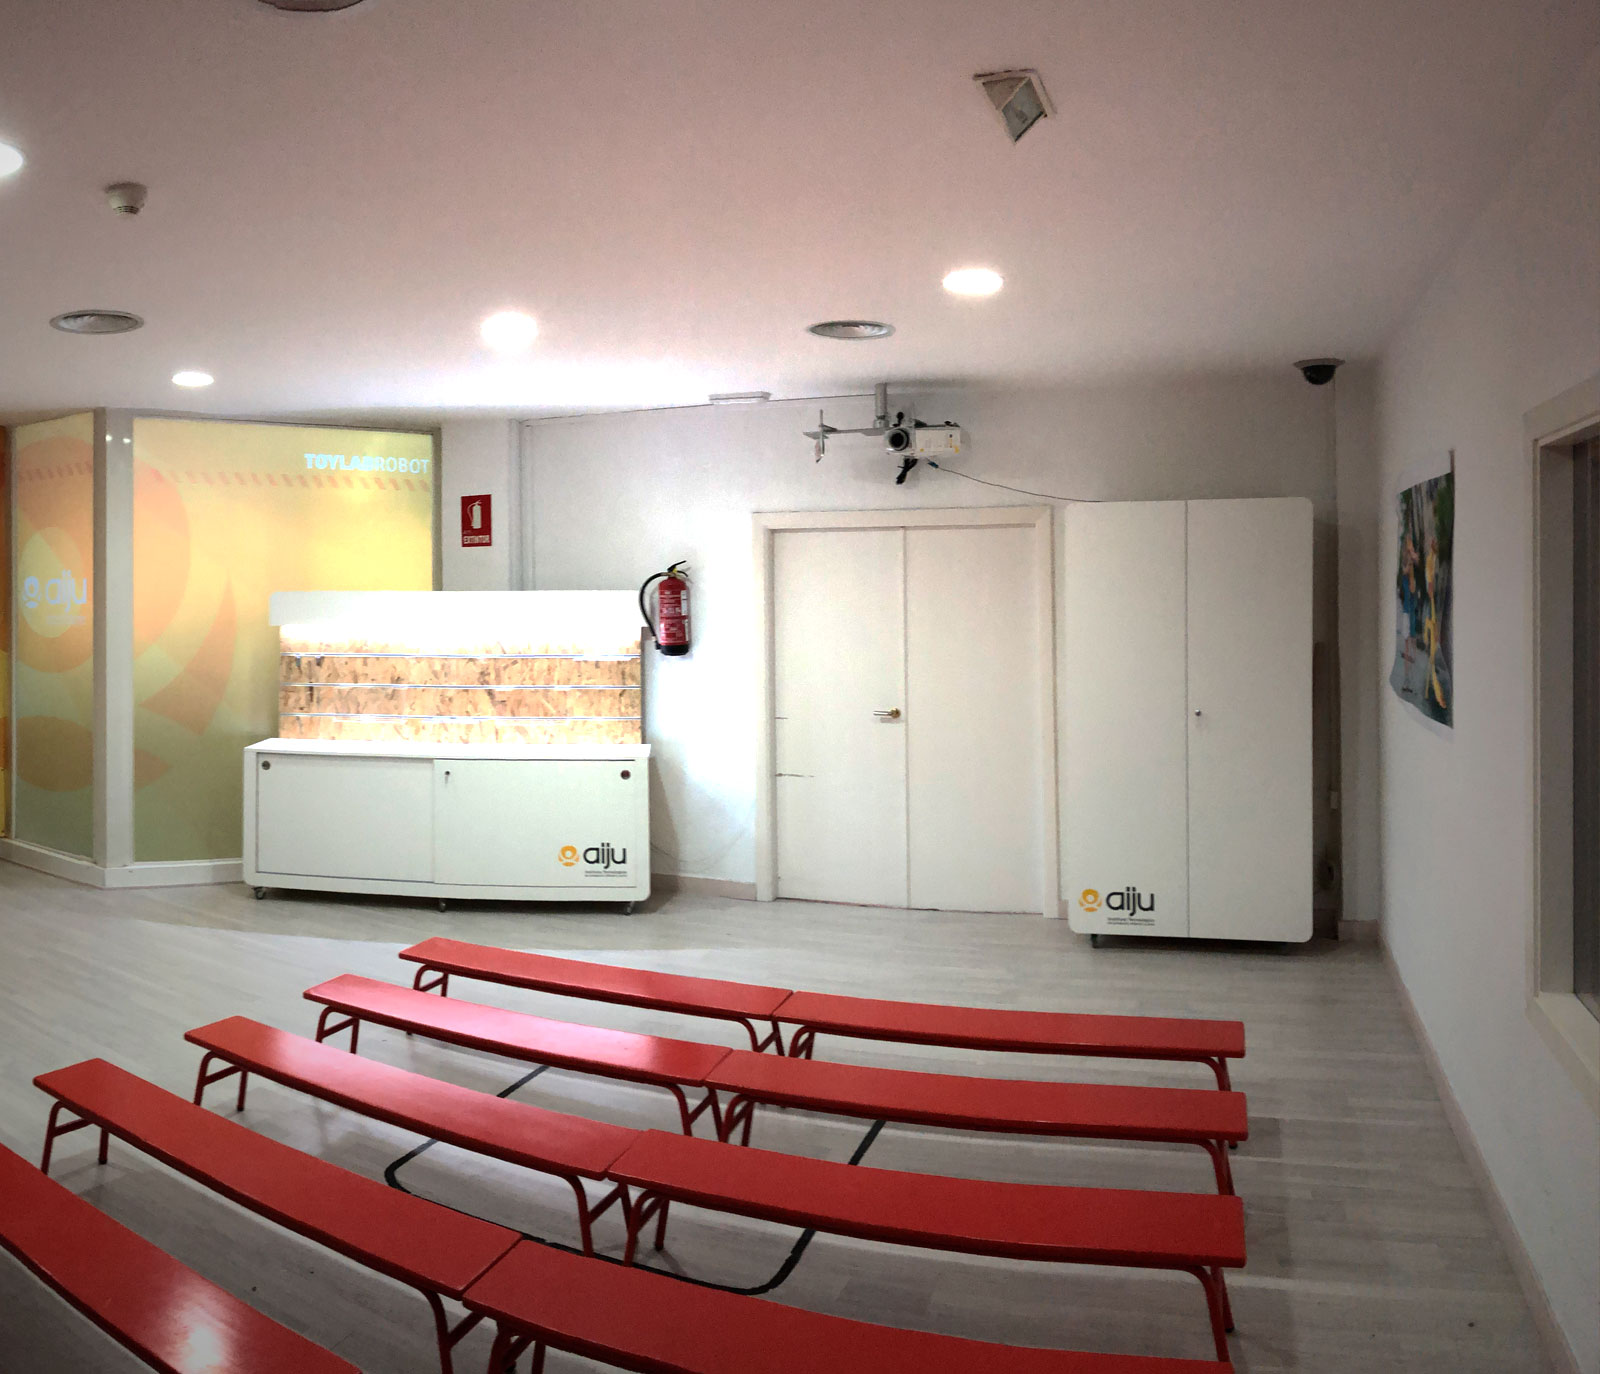 Aiju-Portega-estudio-creativo-6